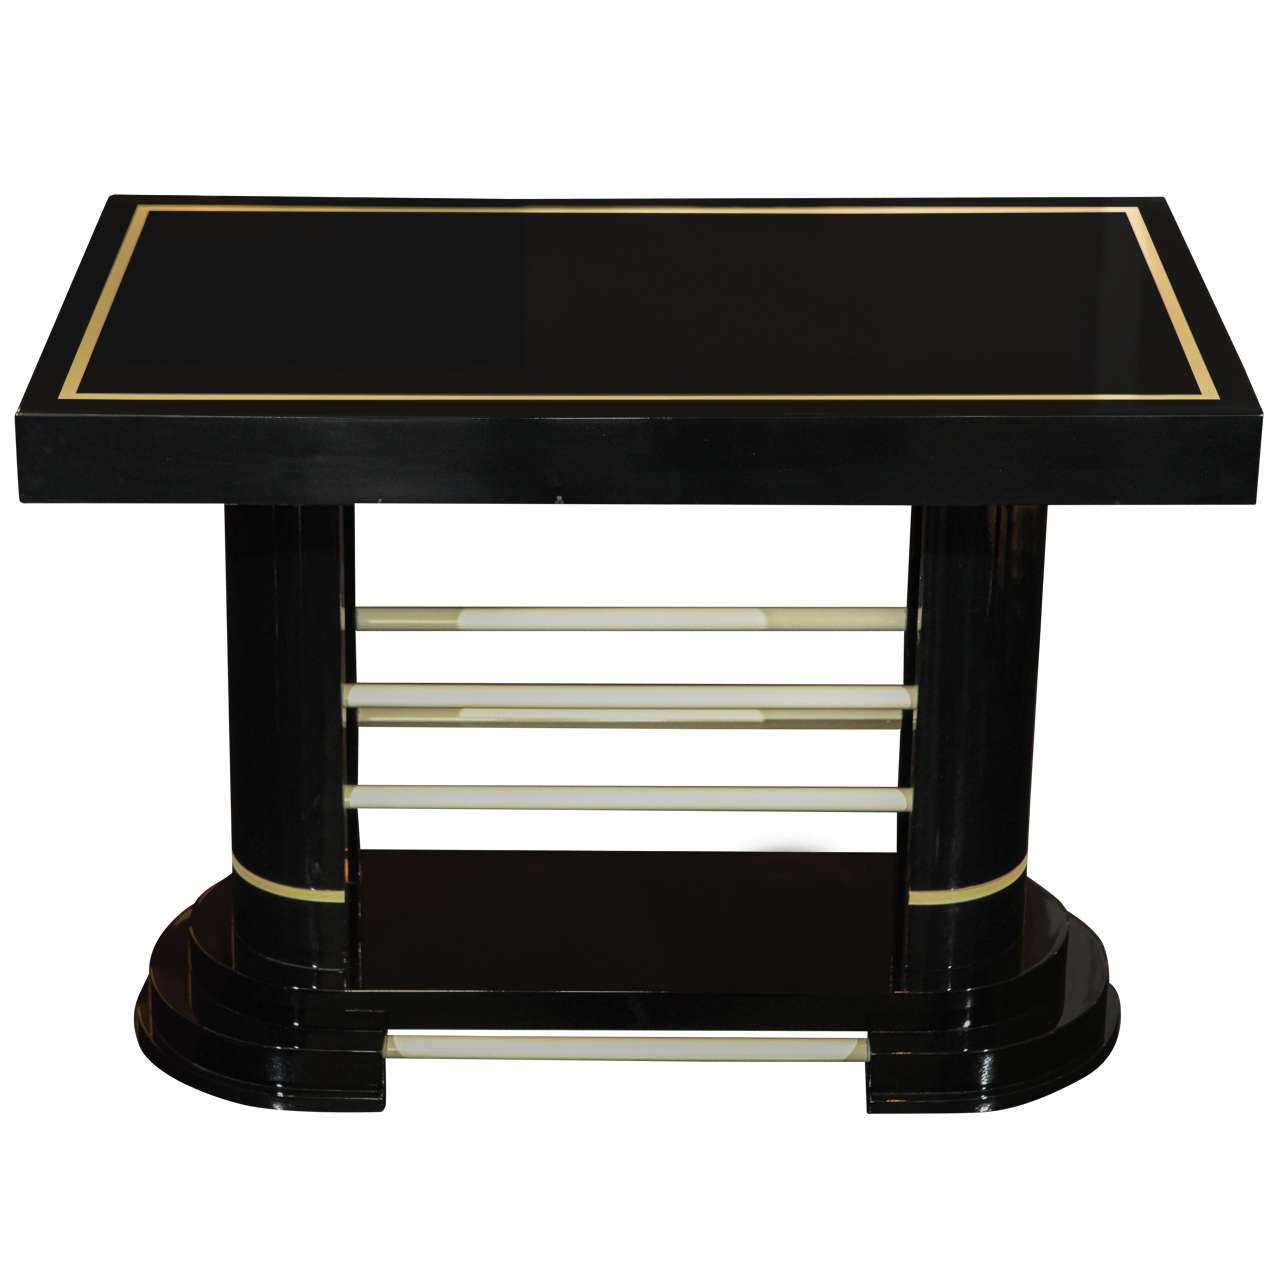 Modernistic Side Table At 1stdibs